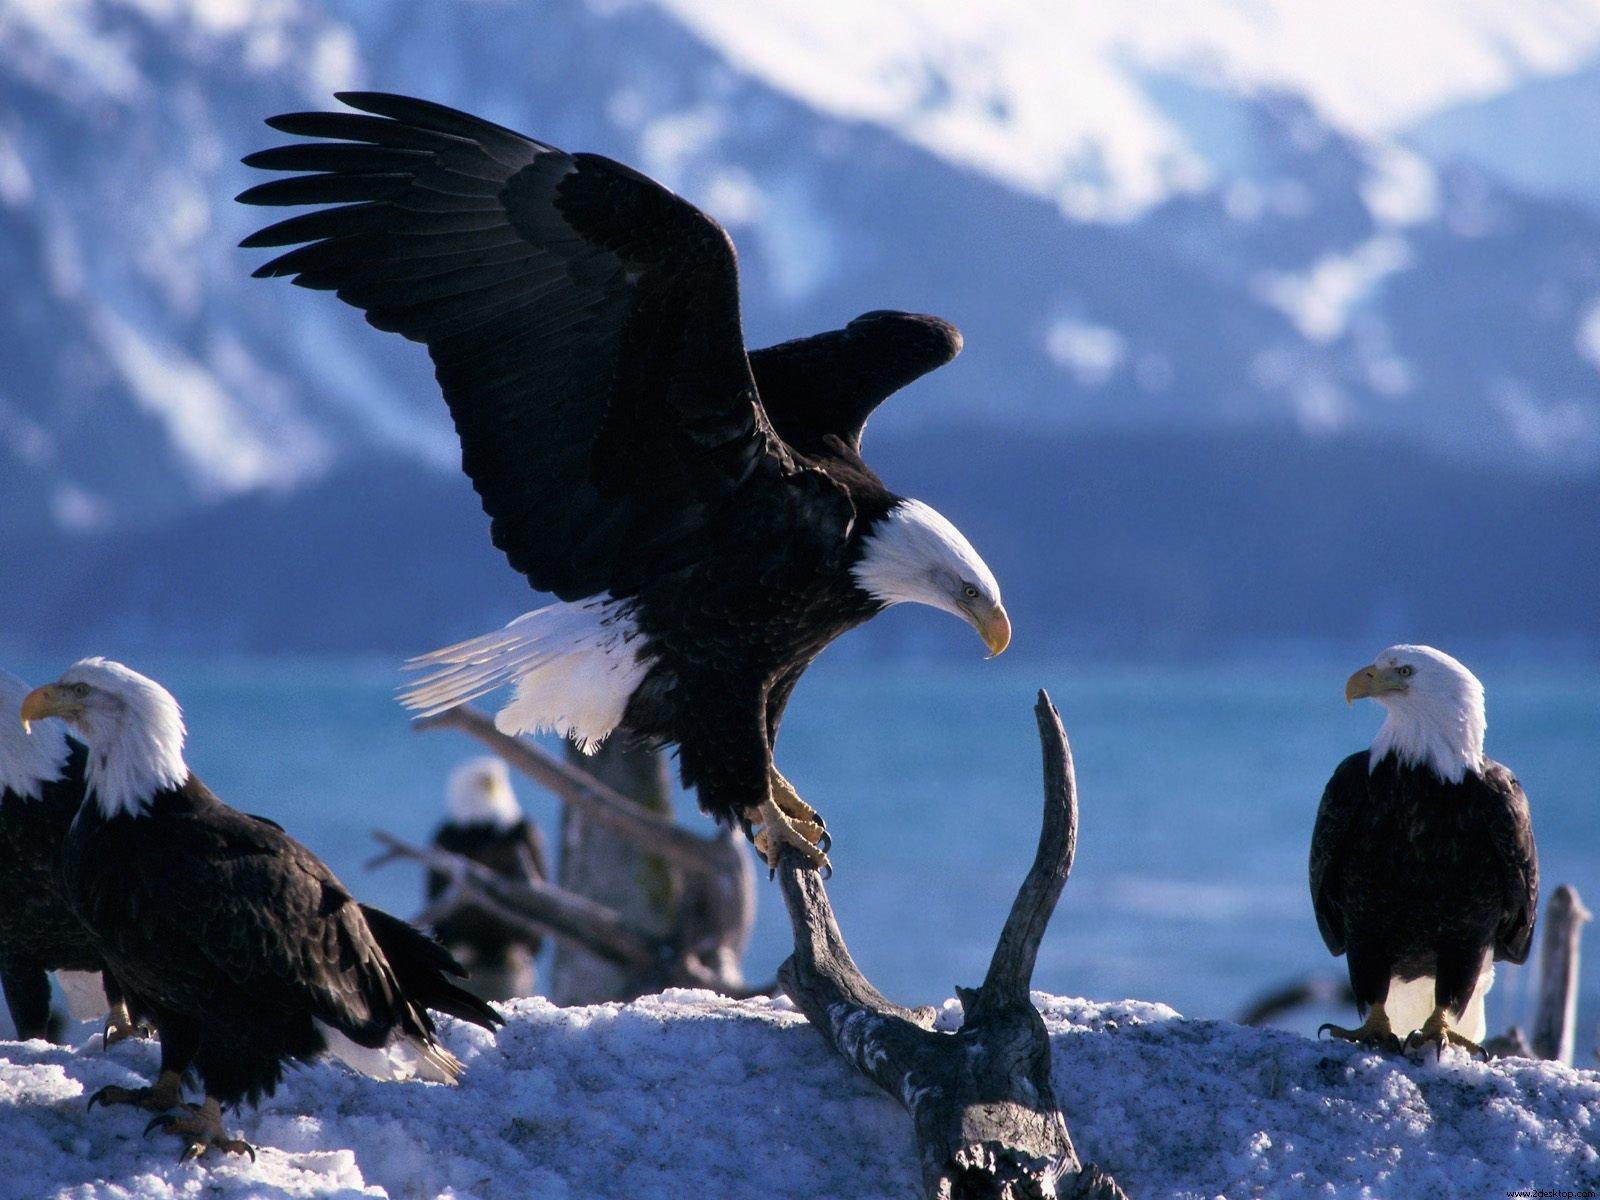 http://4.bp.blogspot.com/-wP0eZlbPh64/TjhwiSL8r5I/AAAAAAAAAFo/woxa5aZ1Nj8/s1600/Wings%2BExtended%2BBald%2BEagles.jpg